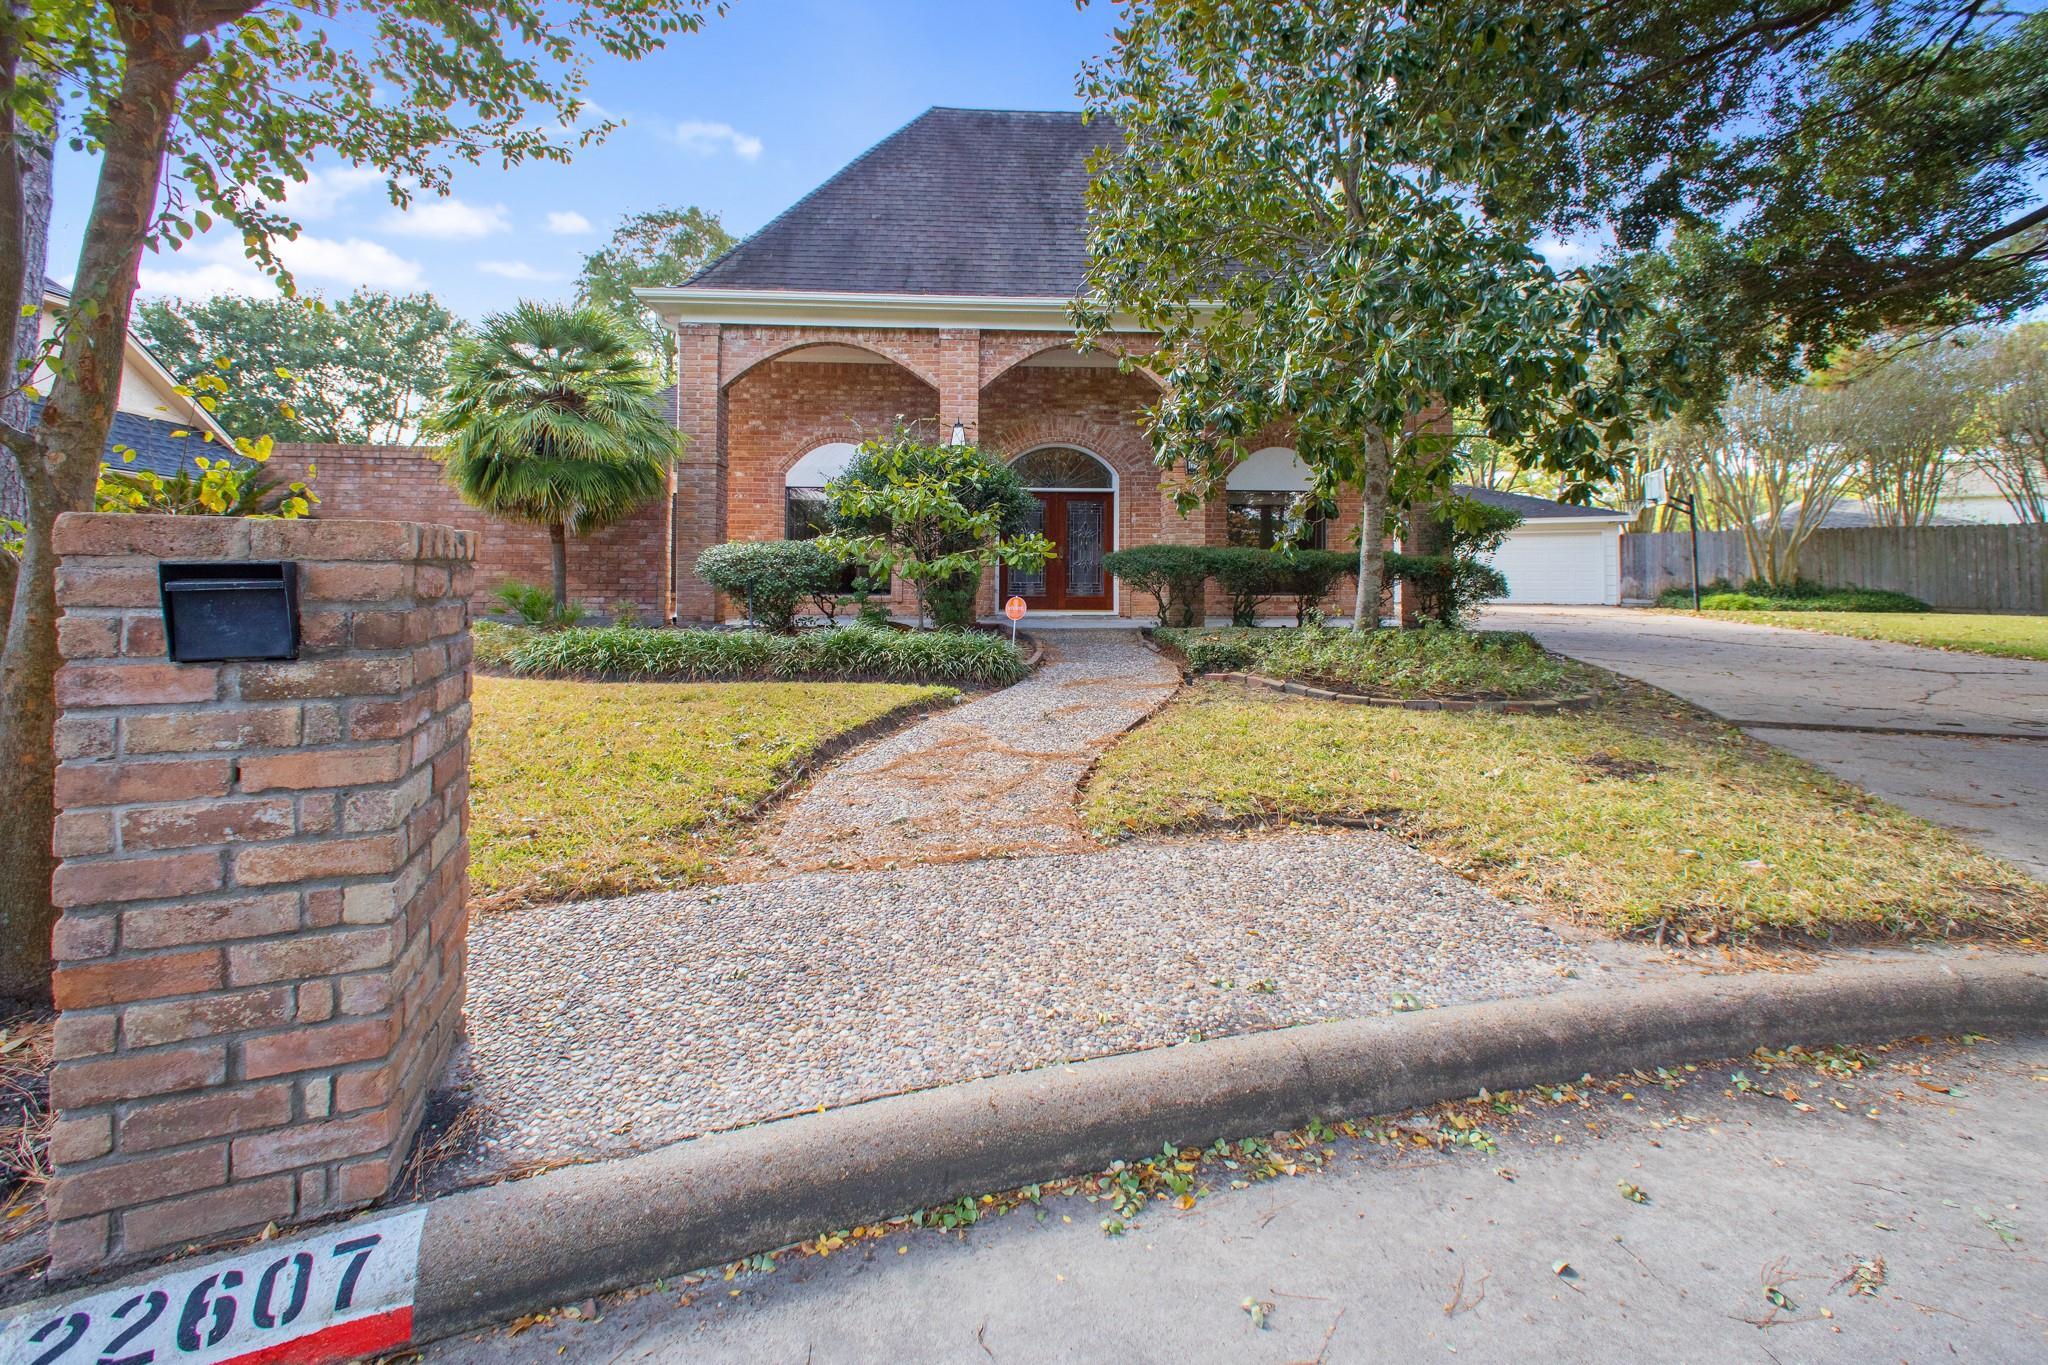 22607 Unicorns Horn Lane Property Photo - Katy, TX real estate listing